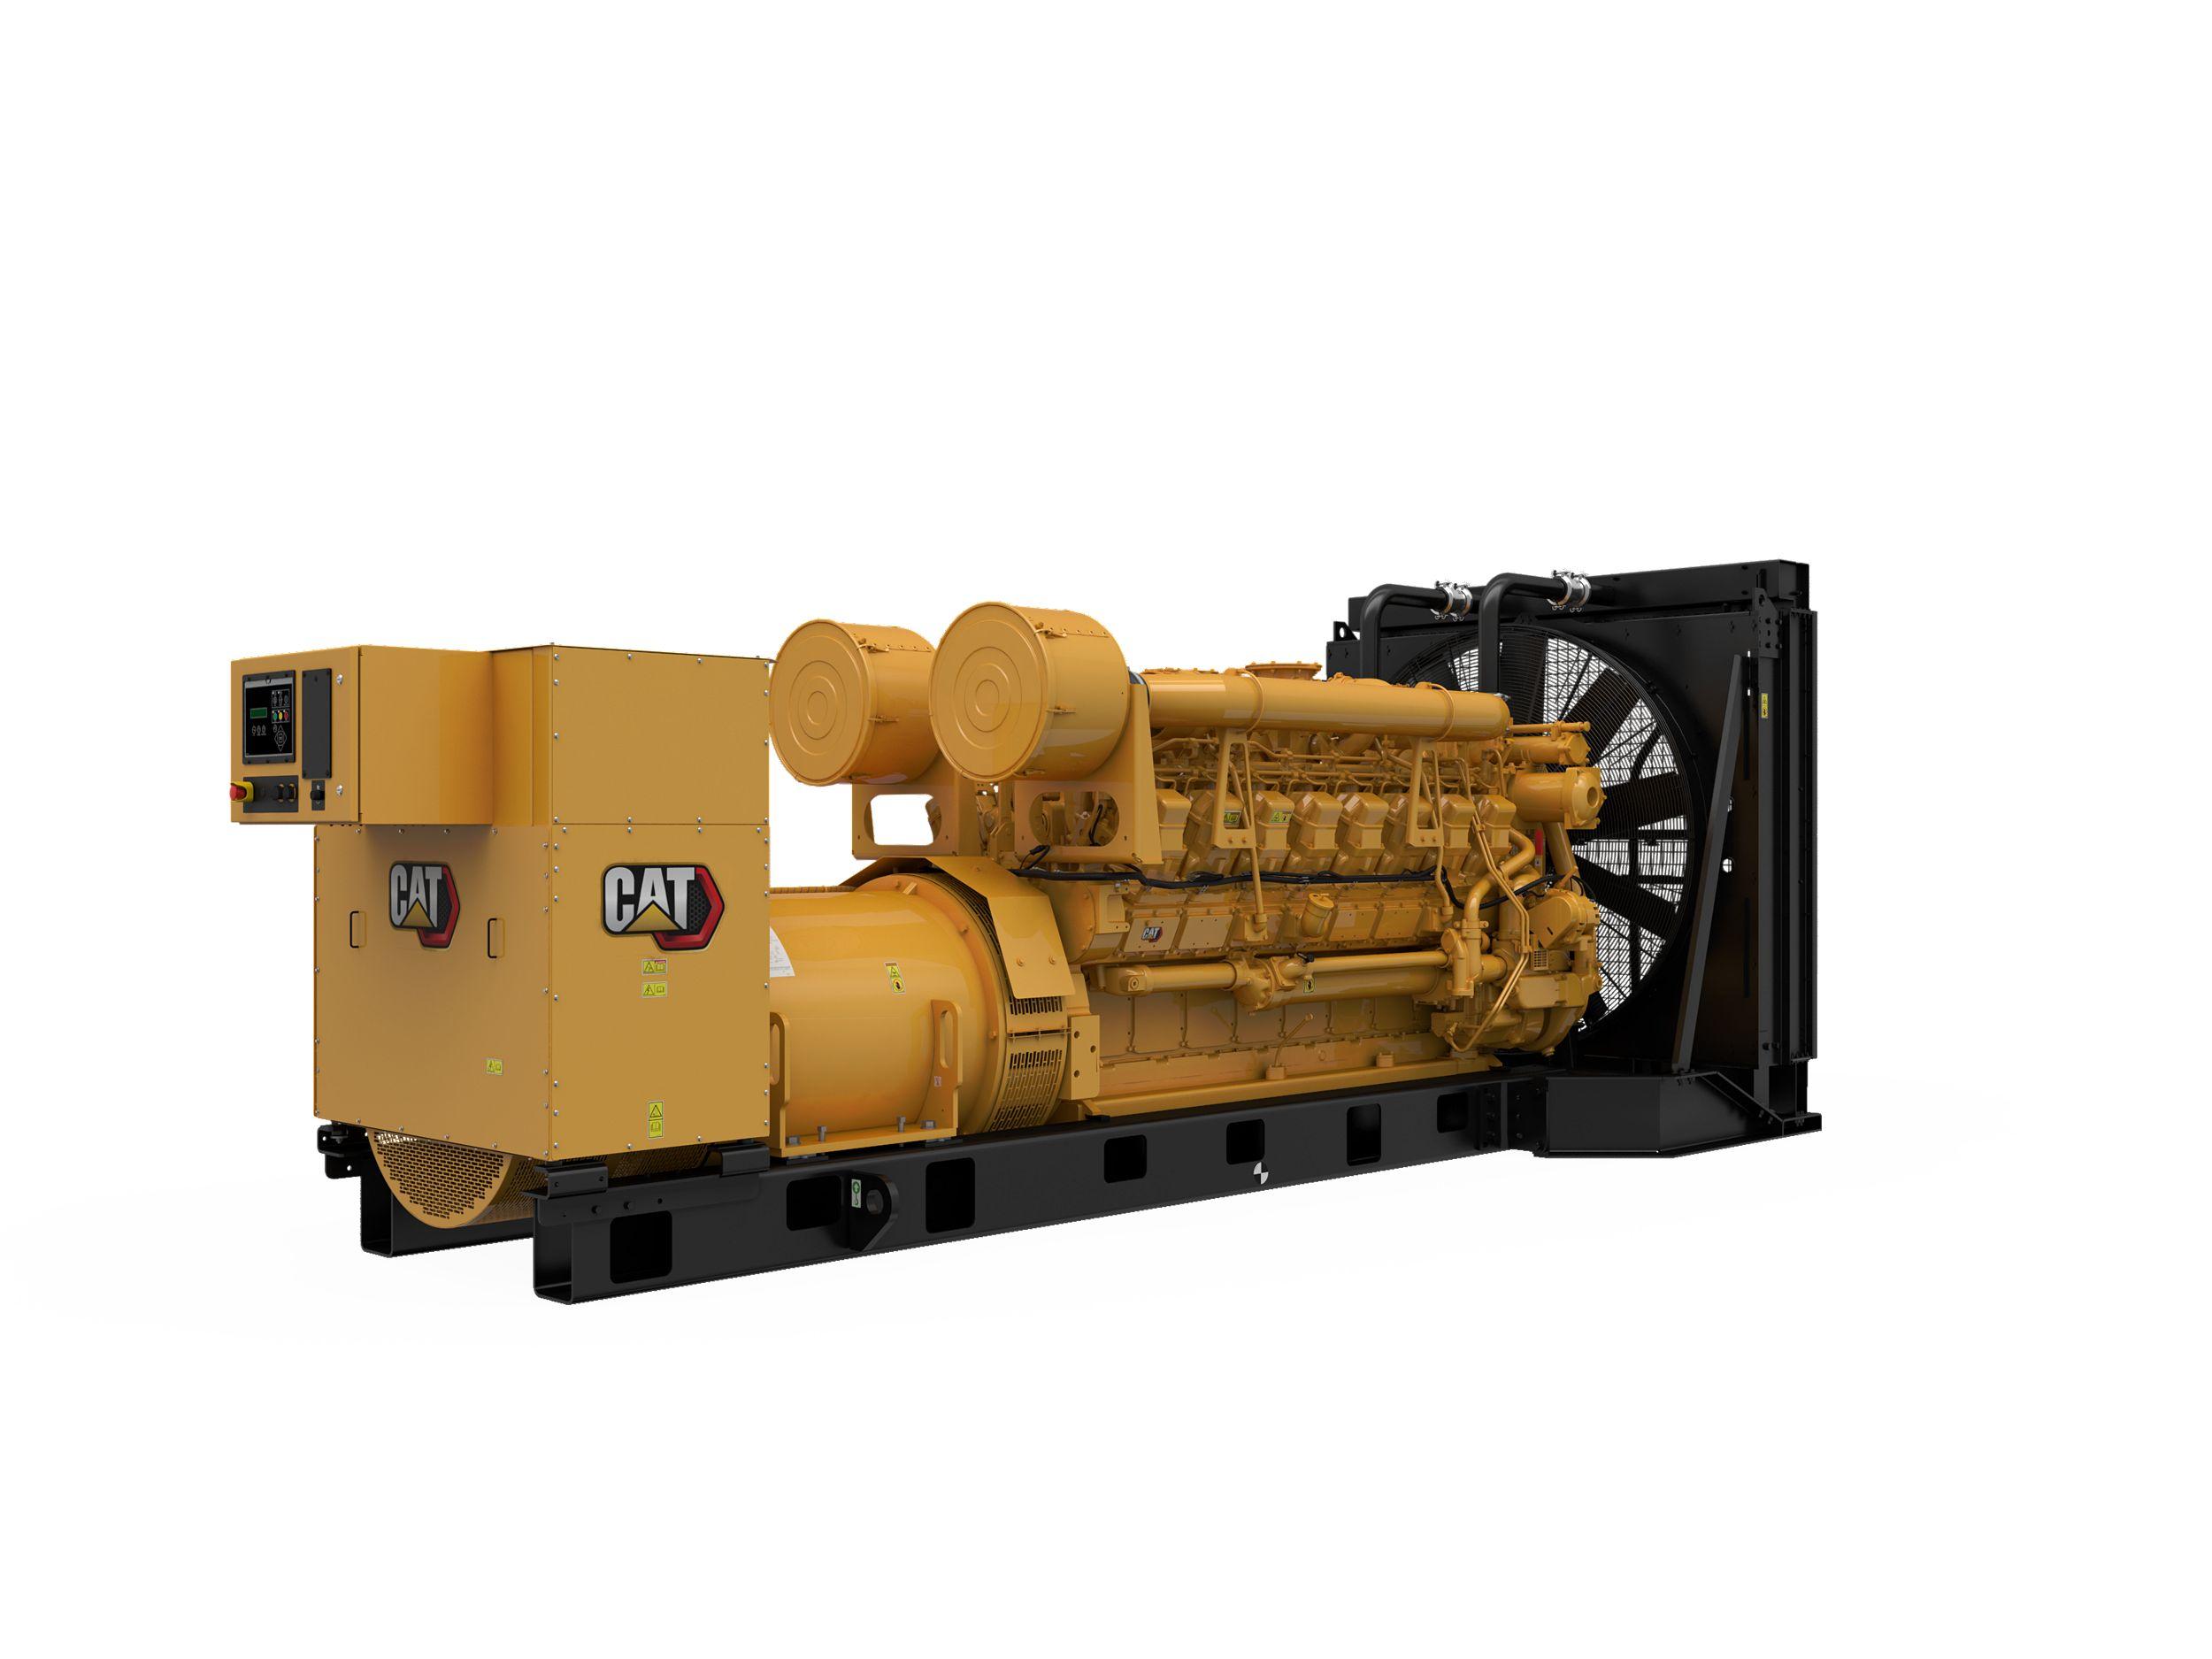 3516 (3516 MUI) Modular Rear Overhang Controls Generator Set, Rear Right